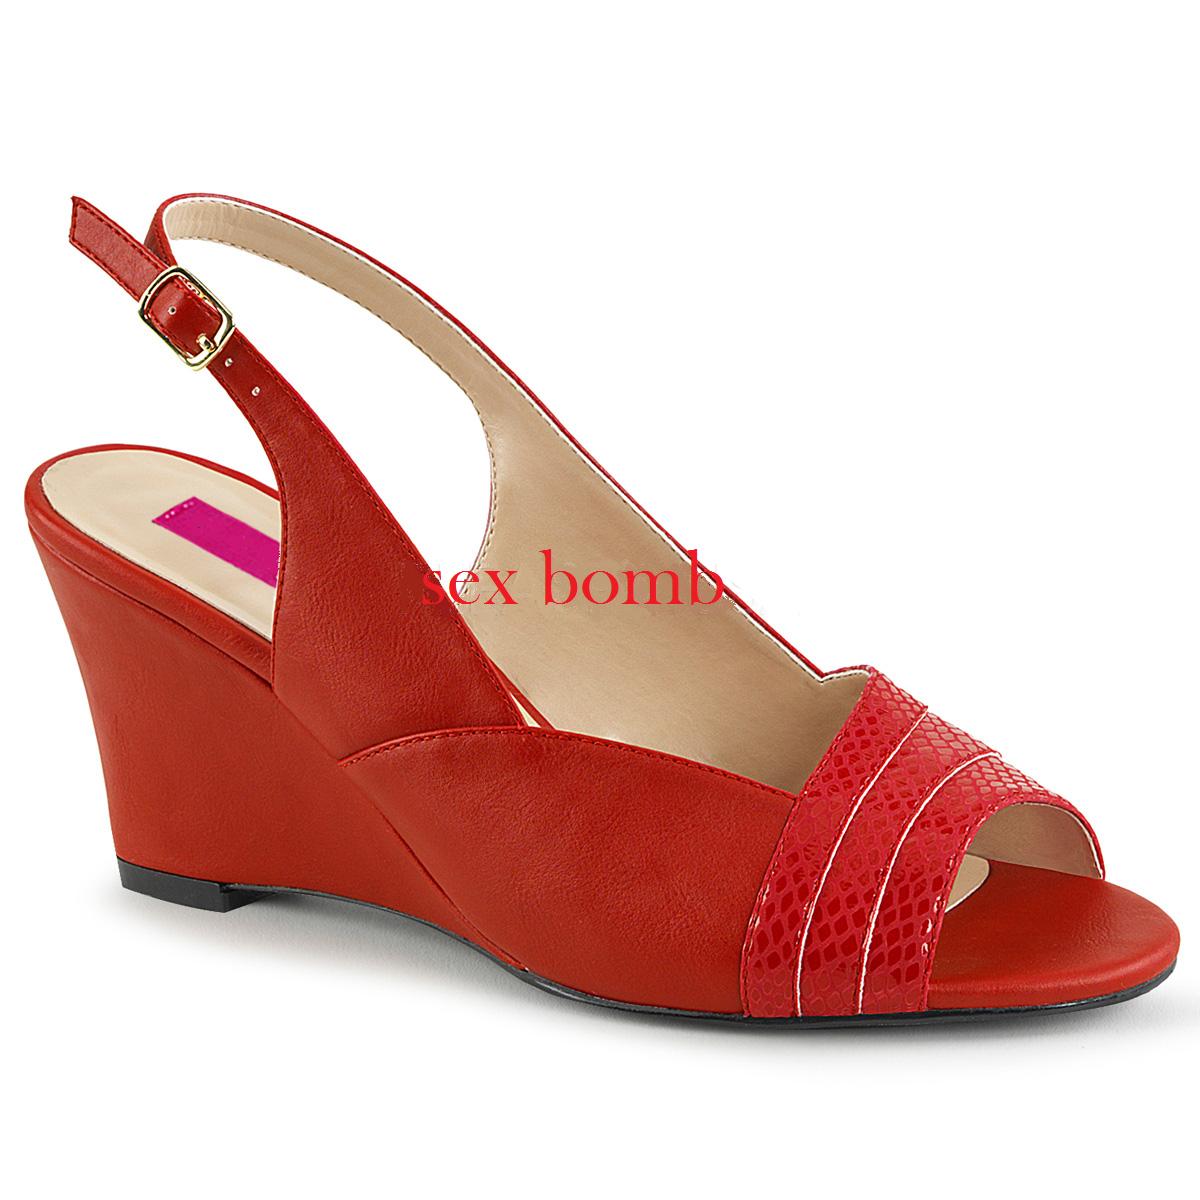 SANDALI tacco 7,5 ZEPPA dal OPACO 39 al 46 ROSSO OPACO dal cinturino scarpe SEXY glamour 19312d